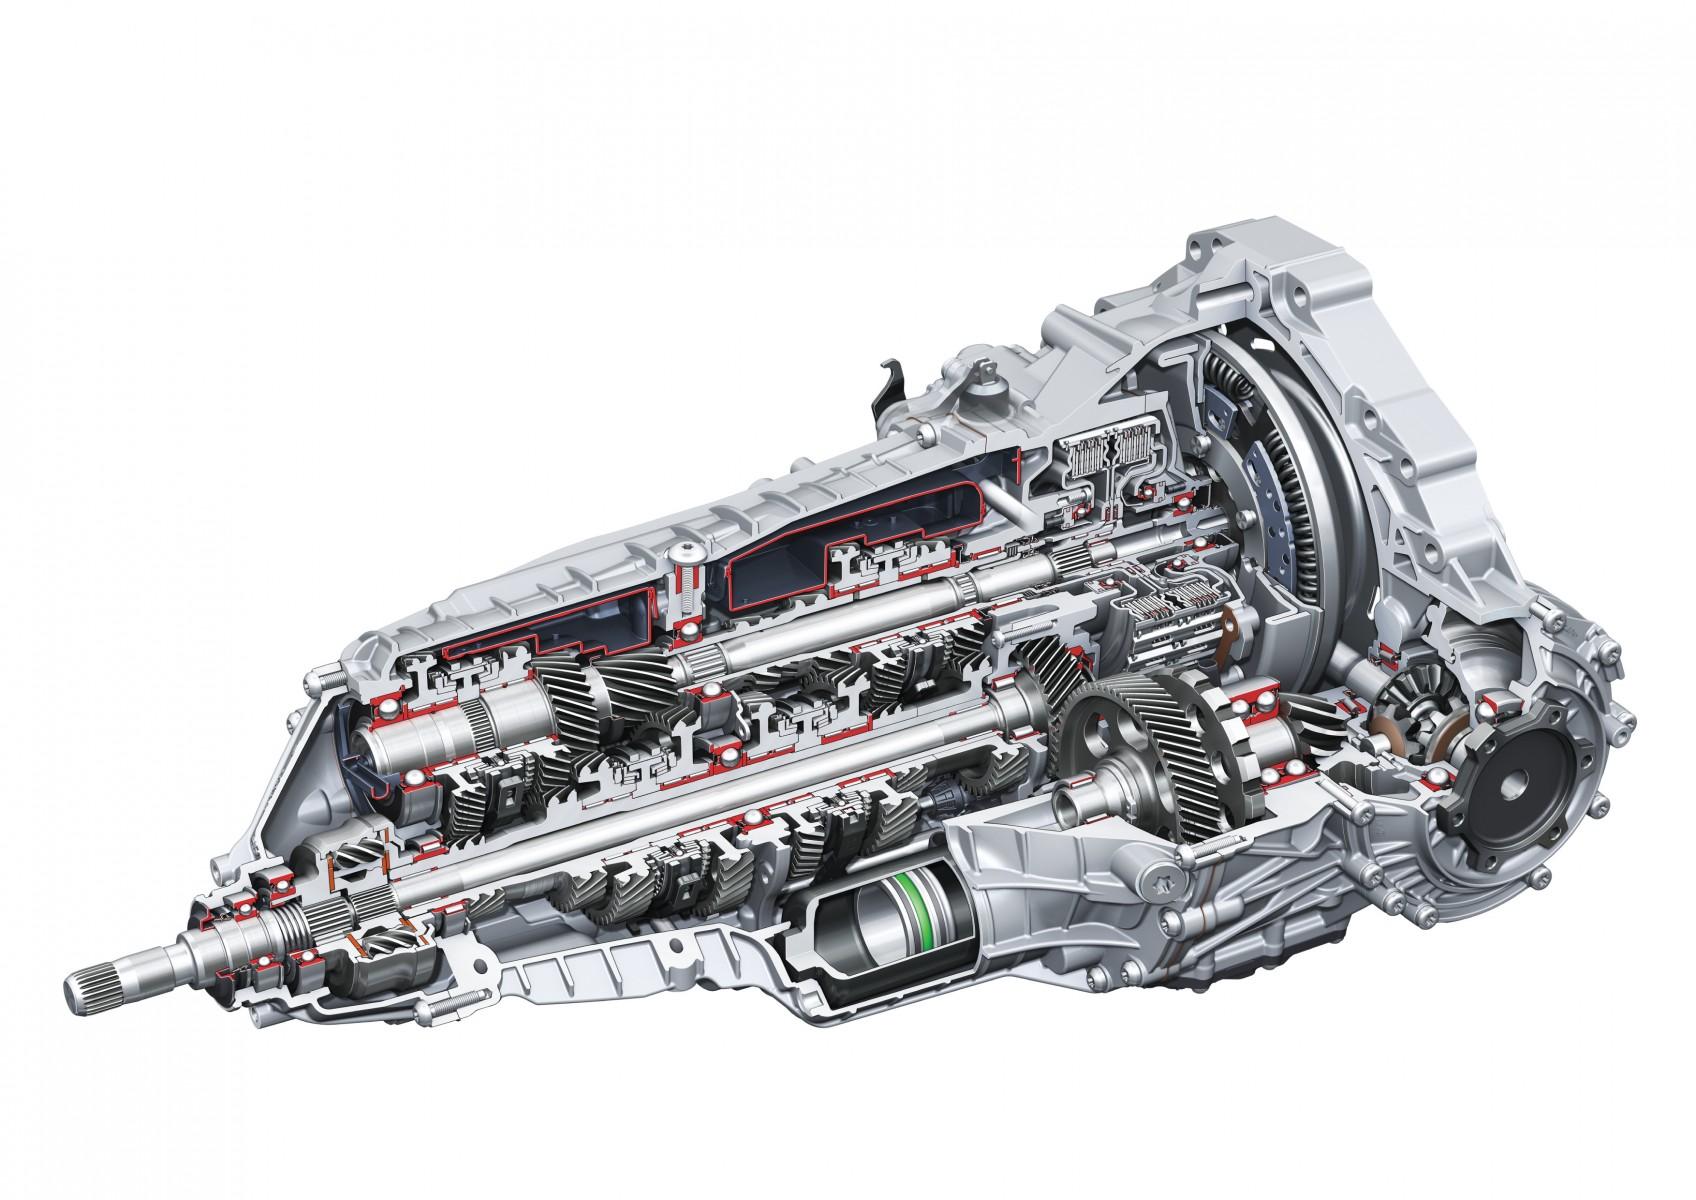 S tronic dual clutch transmission